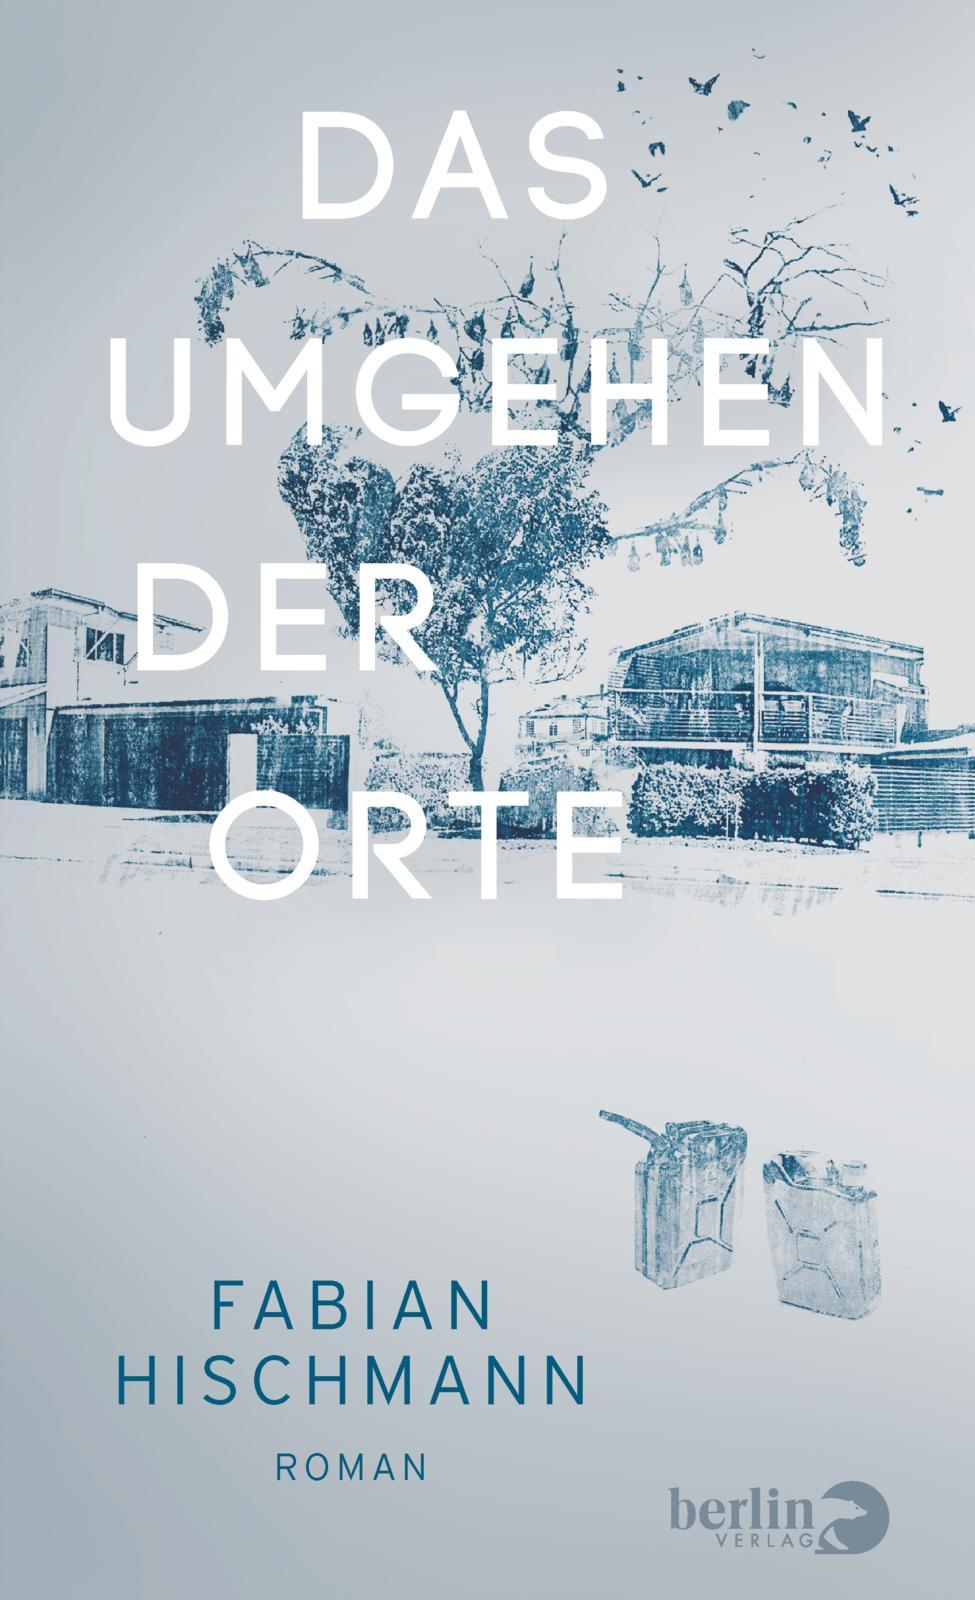 Fabian Hischmann